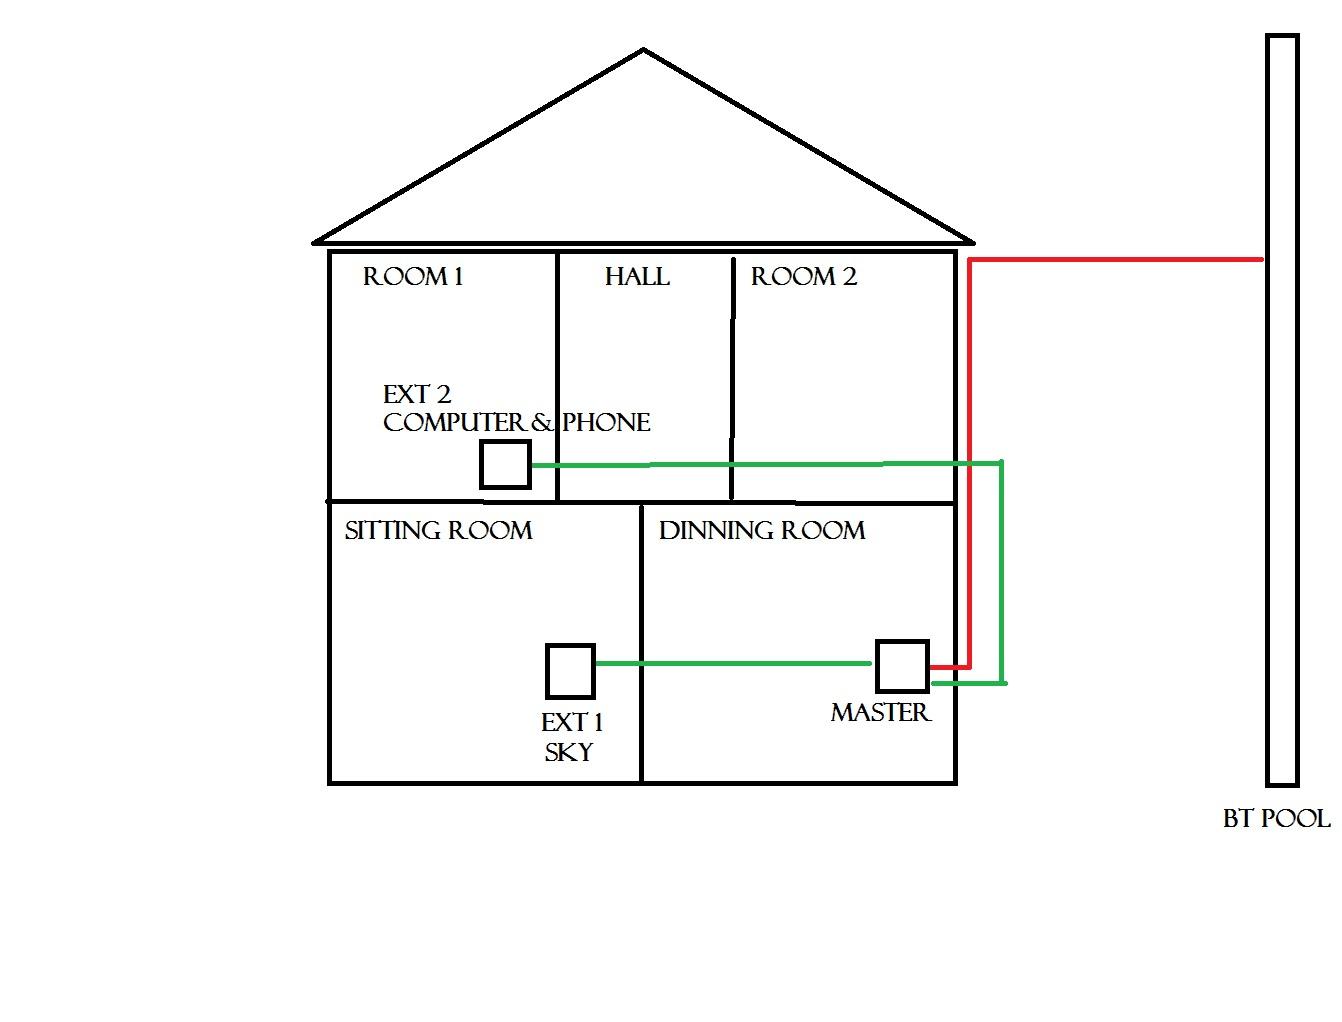 bt infinity 2 wiring diagram wiring librarybt infinity 2 wiring diagram [ 1342 x 1022 Pixel ]